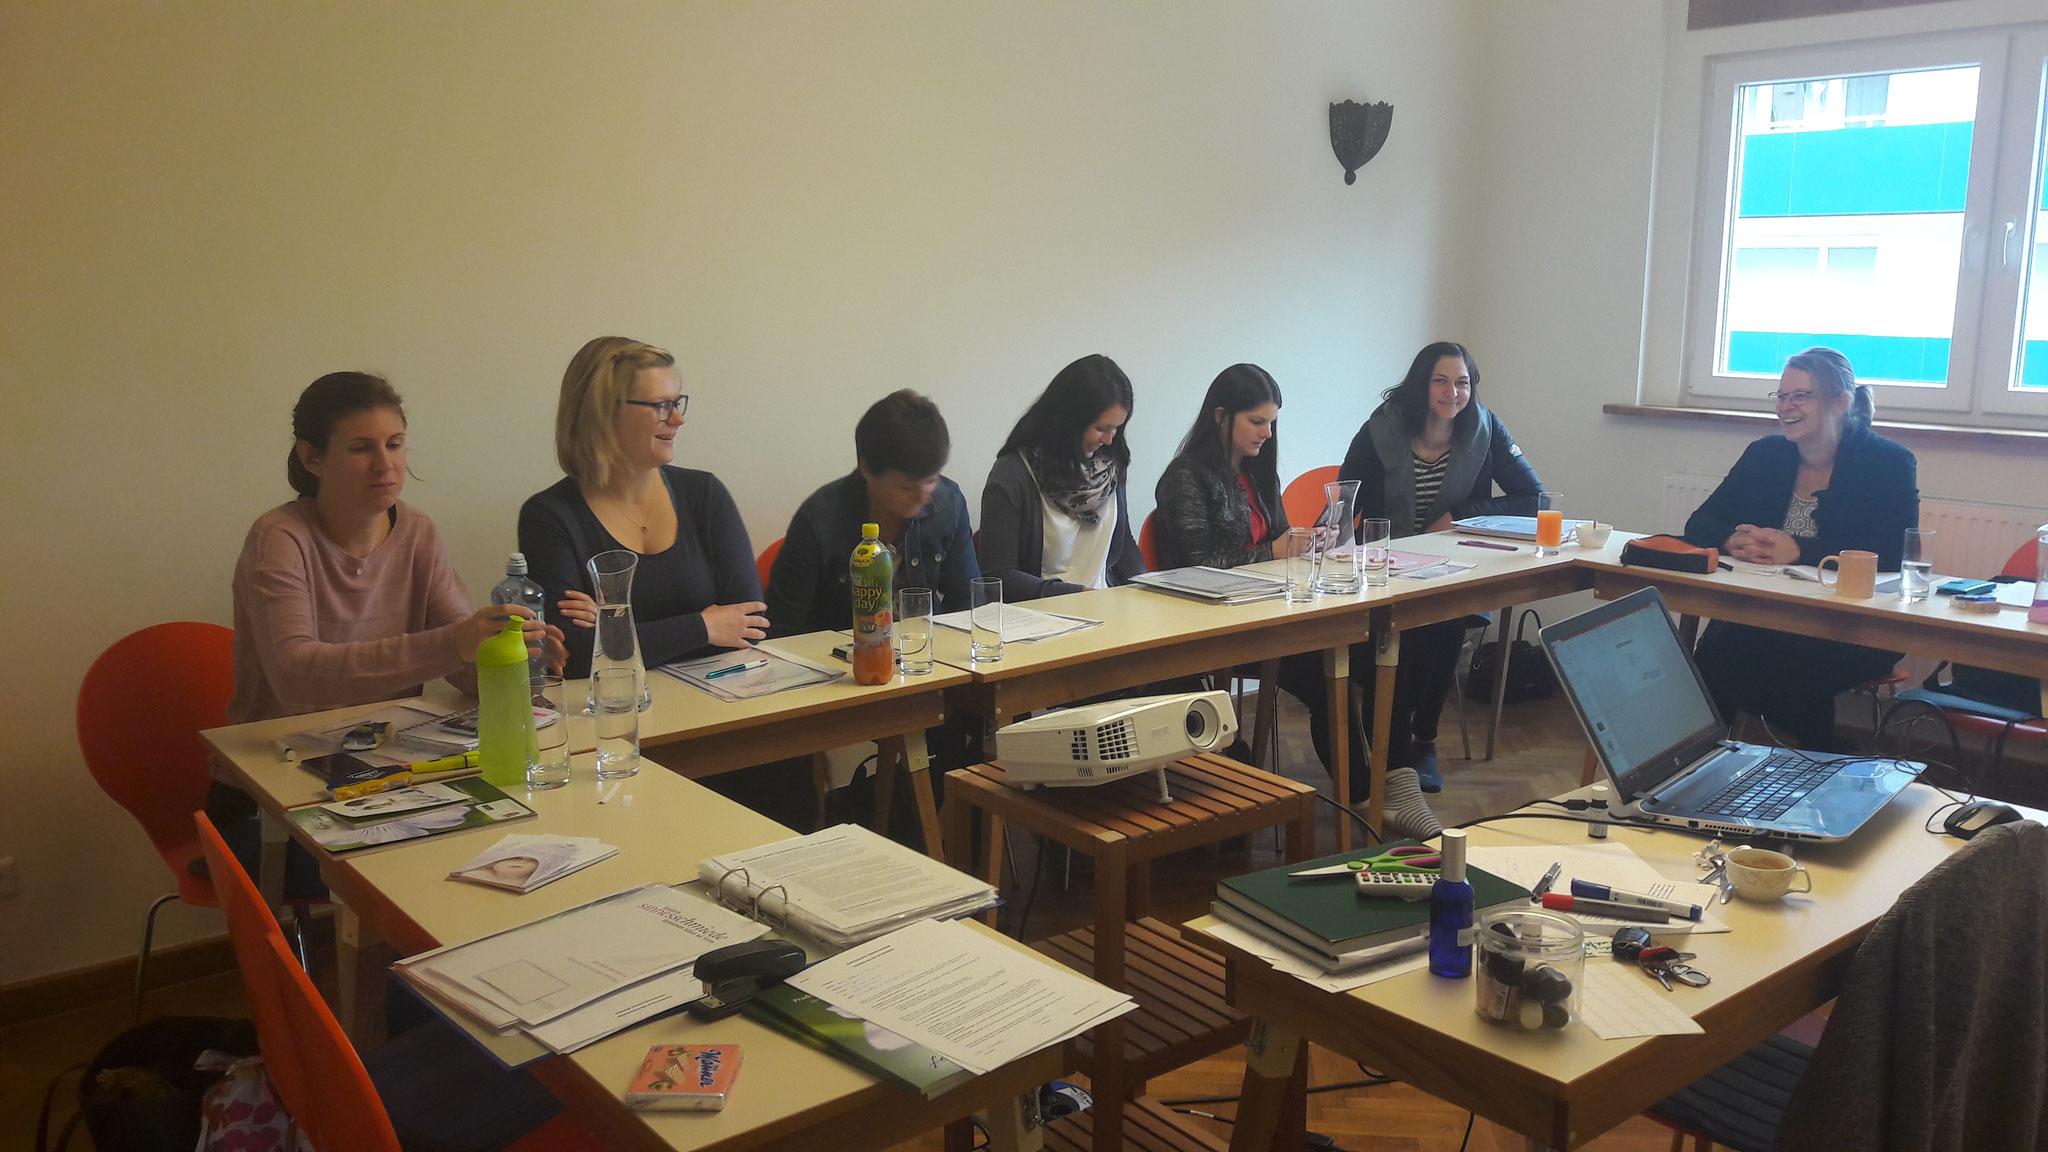 AROMA-Ausbildung und Kurs Frühjahr 2019